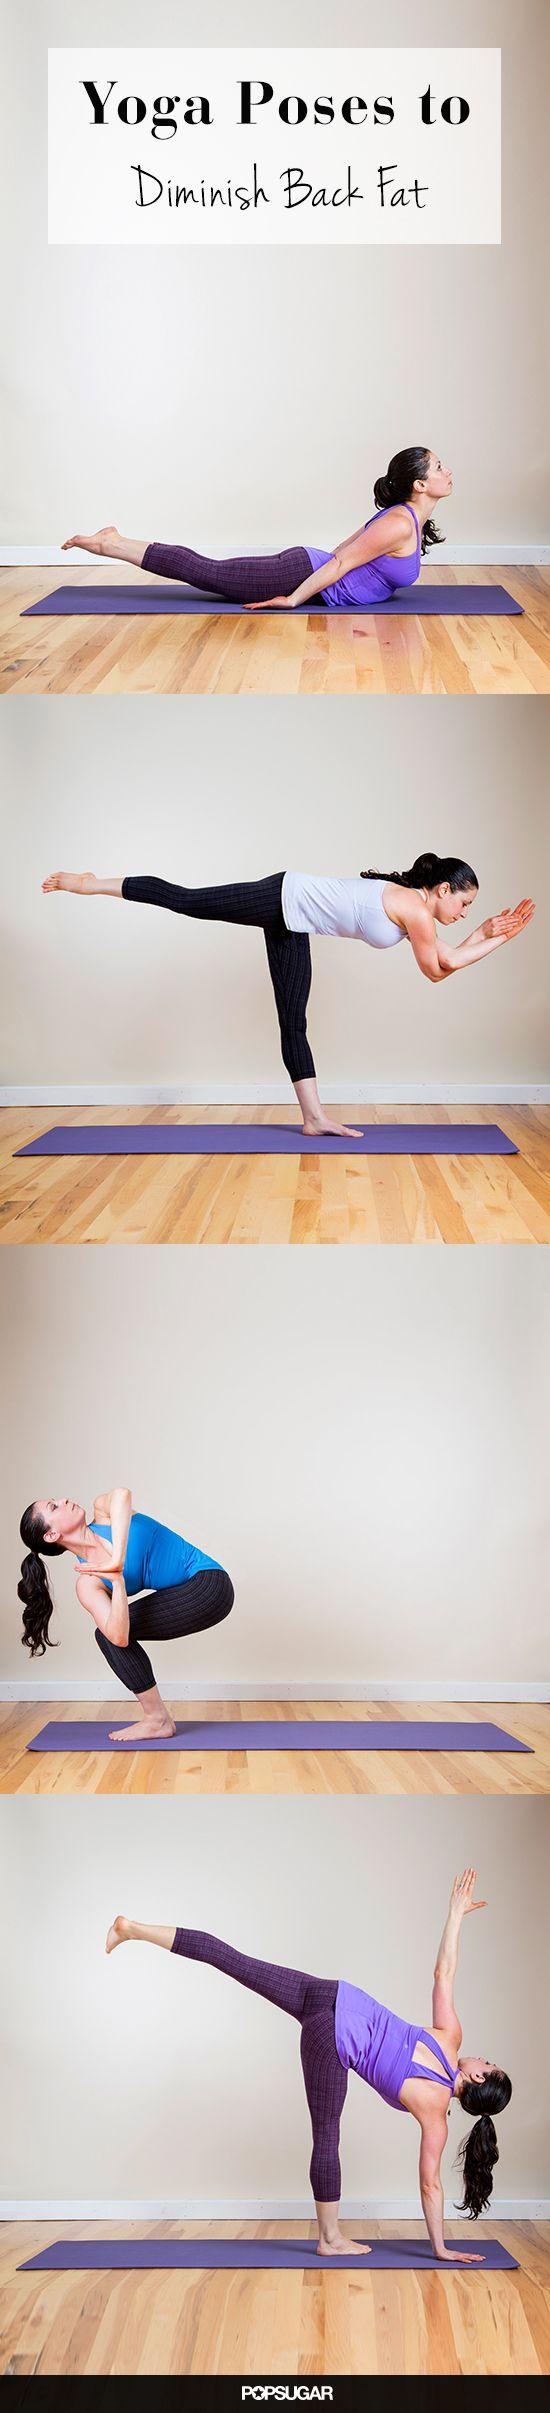 Back-Bulge-Fighting Yoga Poses